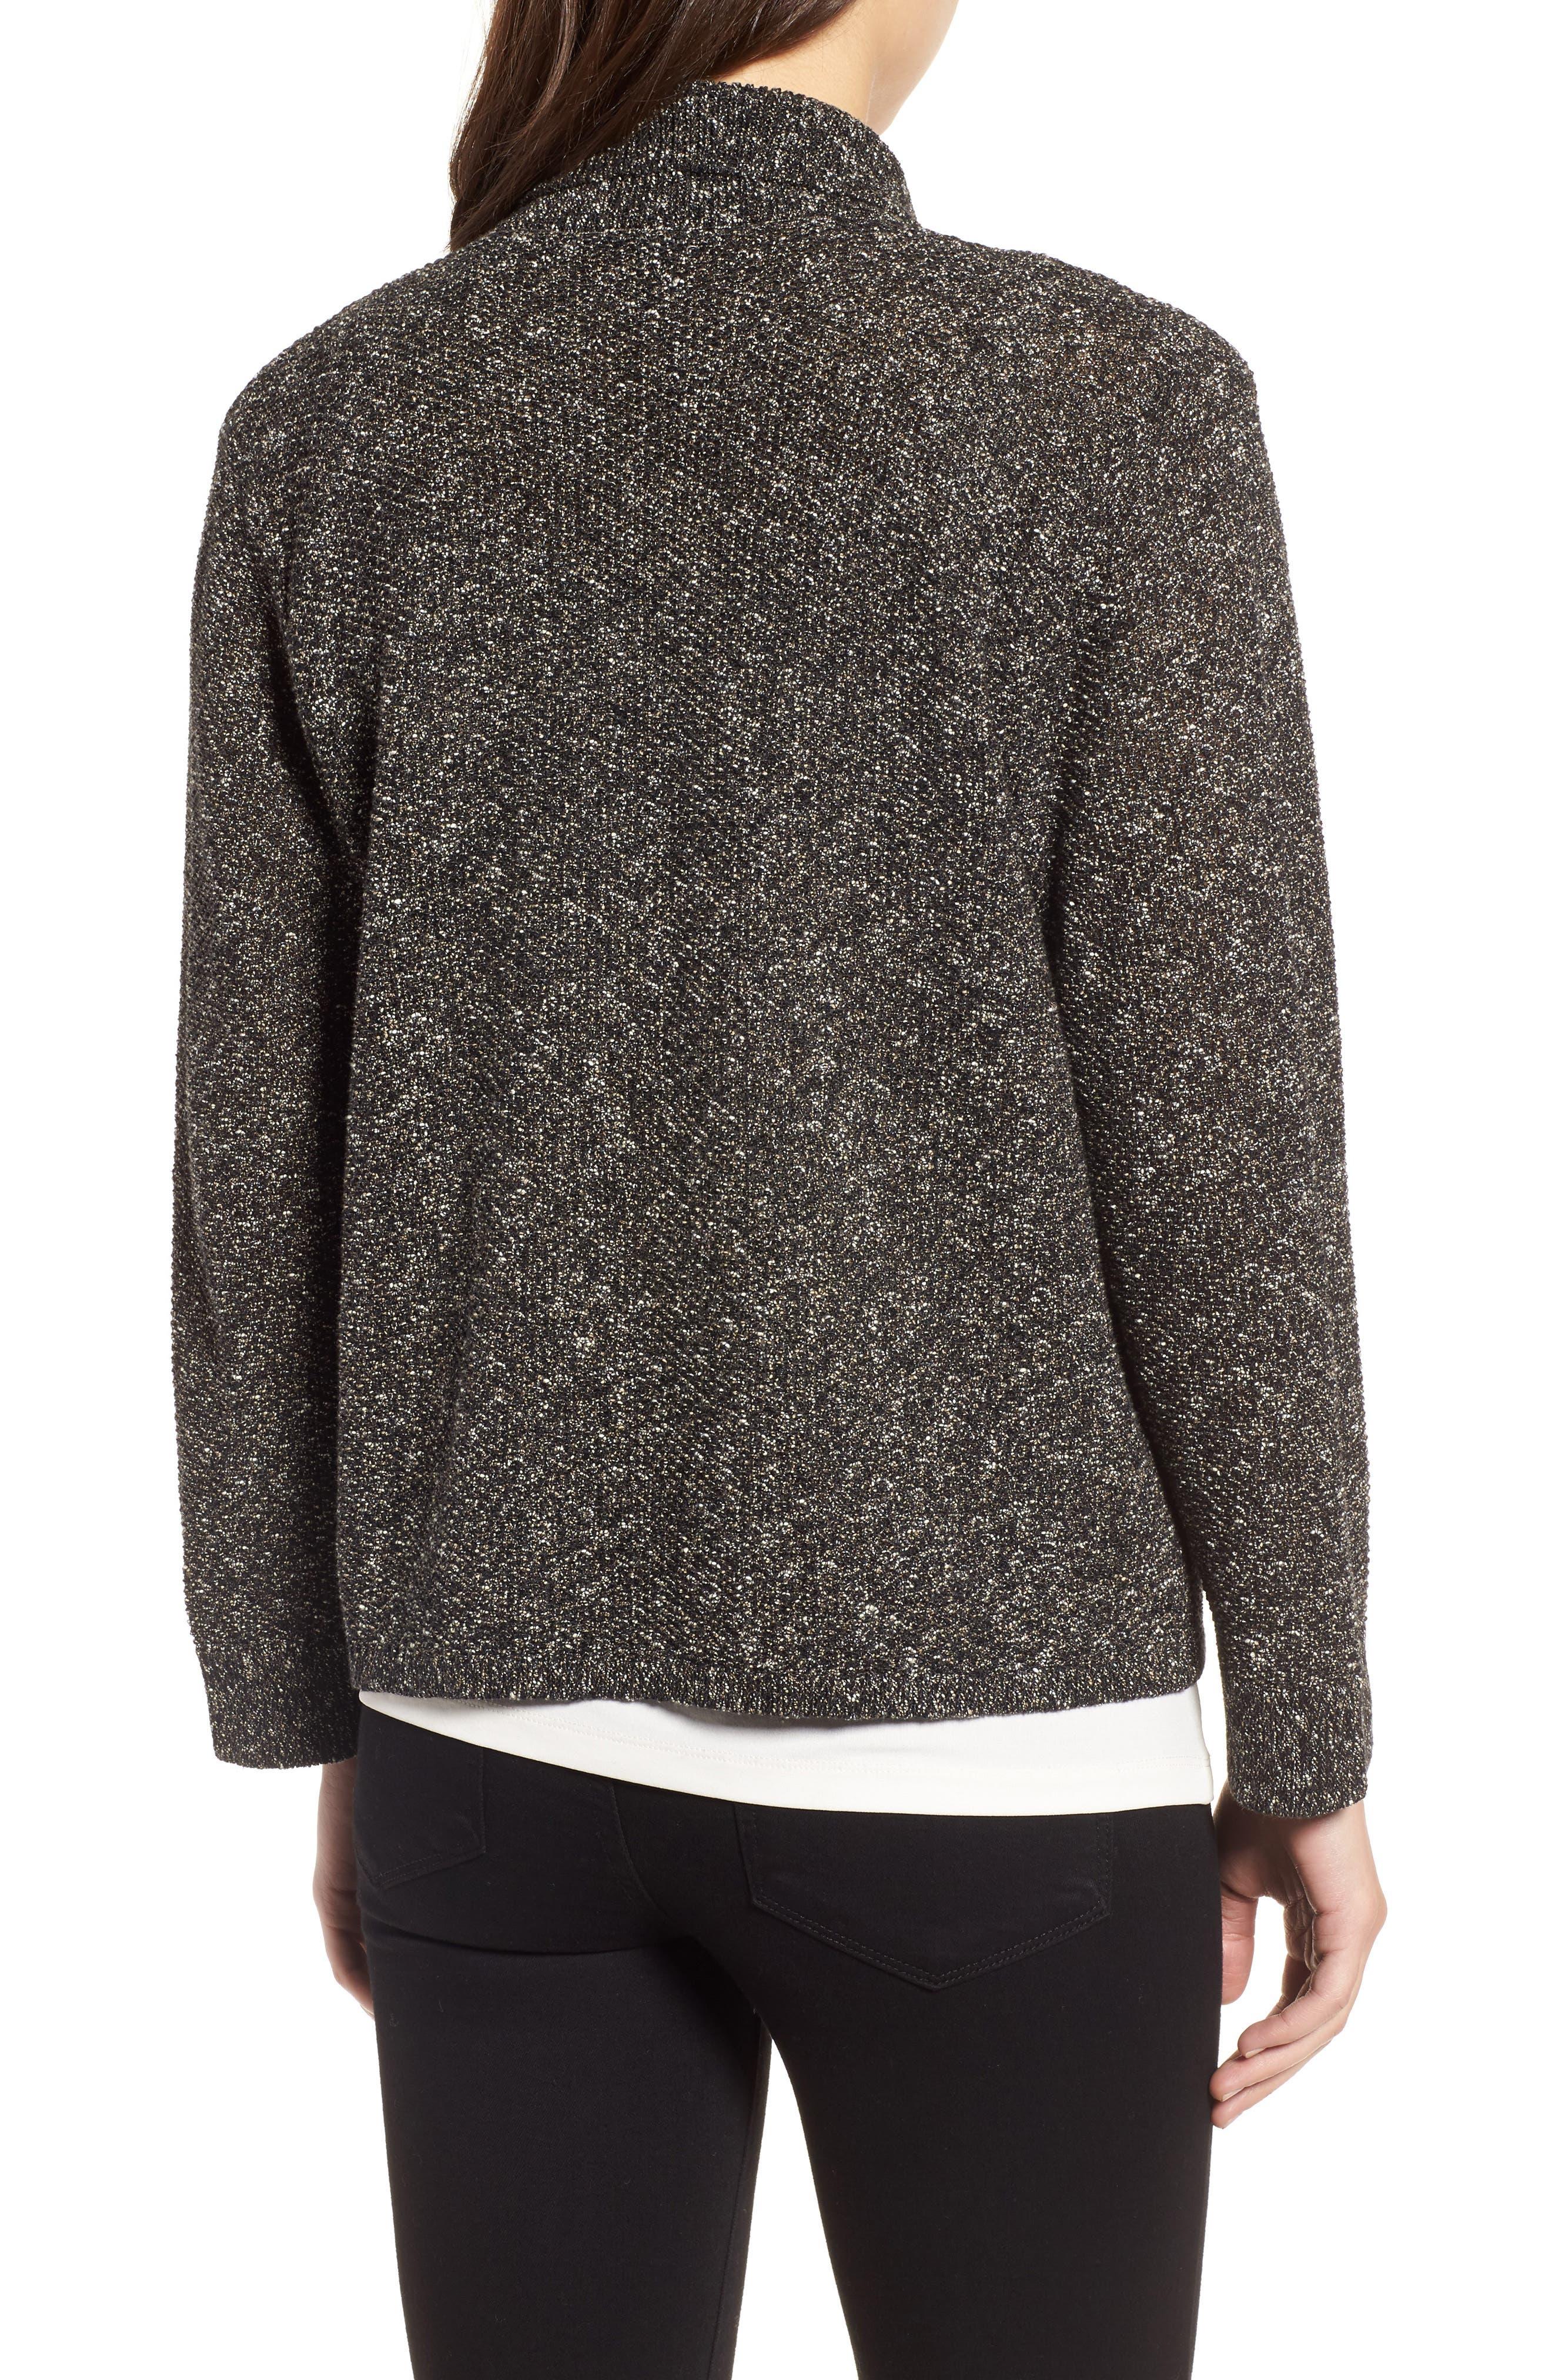 Tweed Sweater Jacket,                             Alternate thumbnail 2, color,                             Black